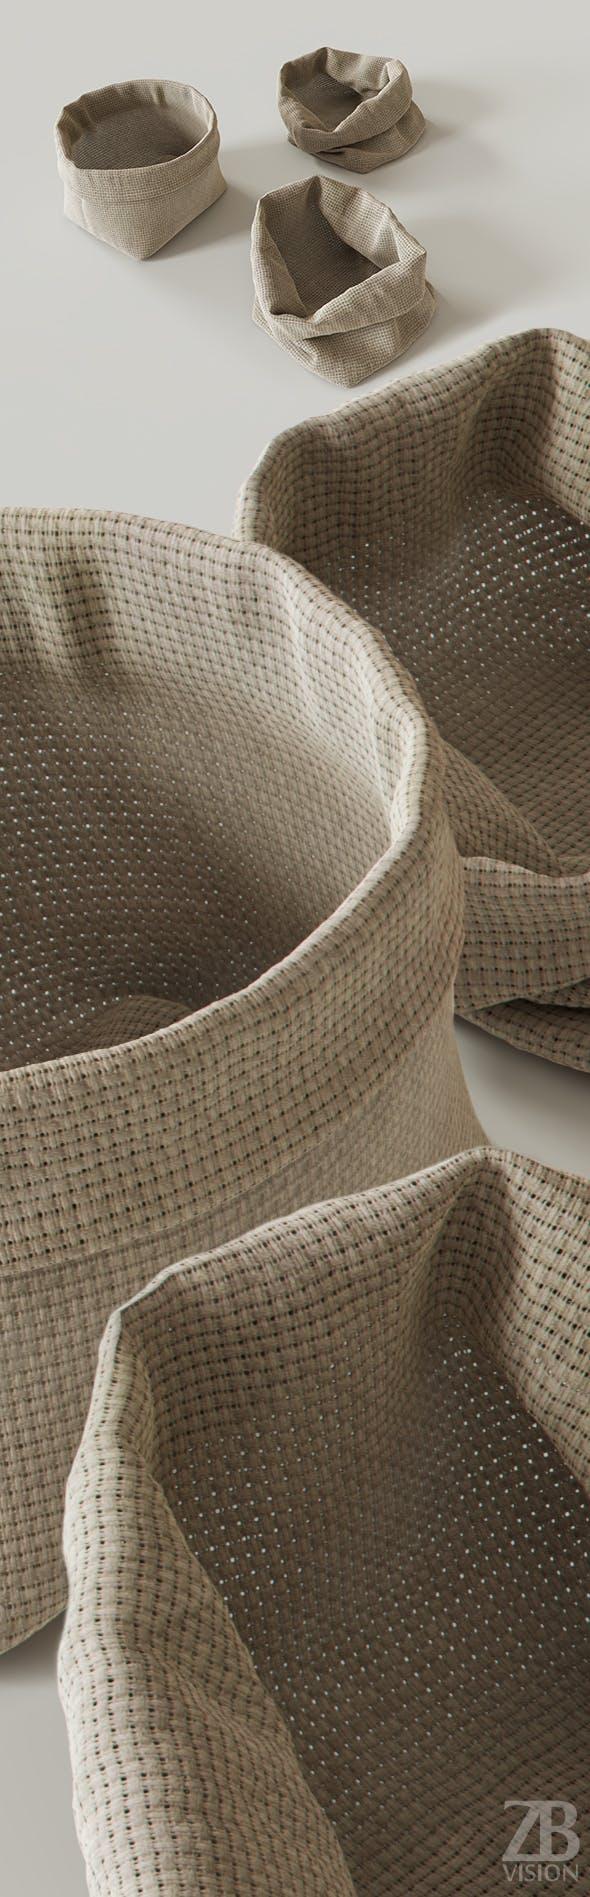 Cloth Sack - 3DOcean Item for Sale